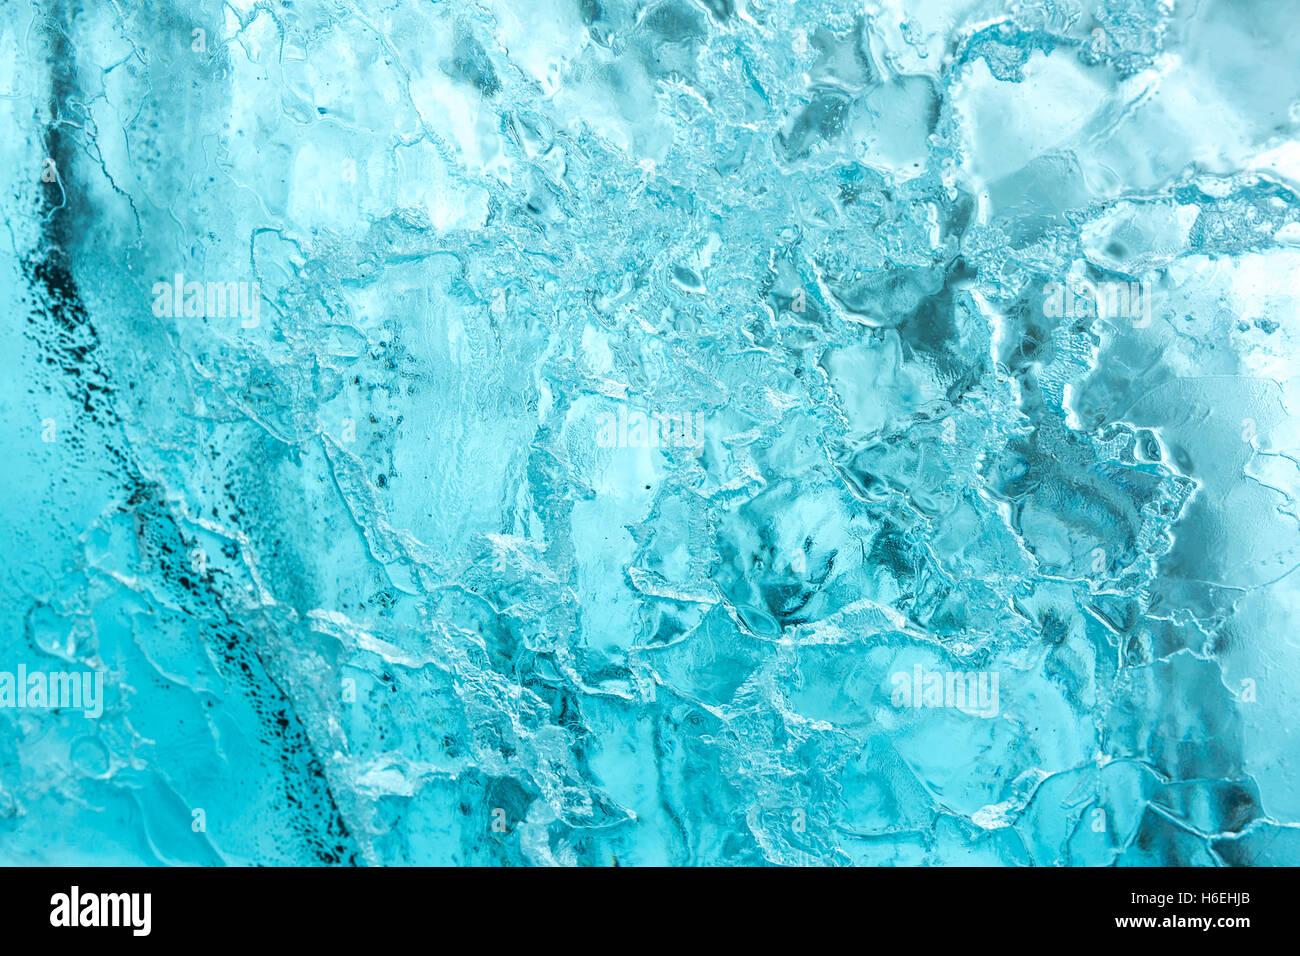 Ice wall background in Cave Iceland at Vatnajokull Glacier Jokulsarlon Nationa Park - Stock Image